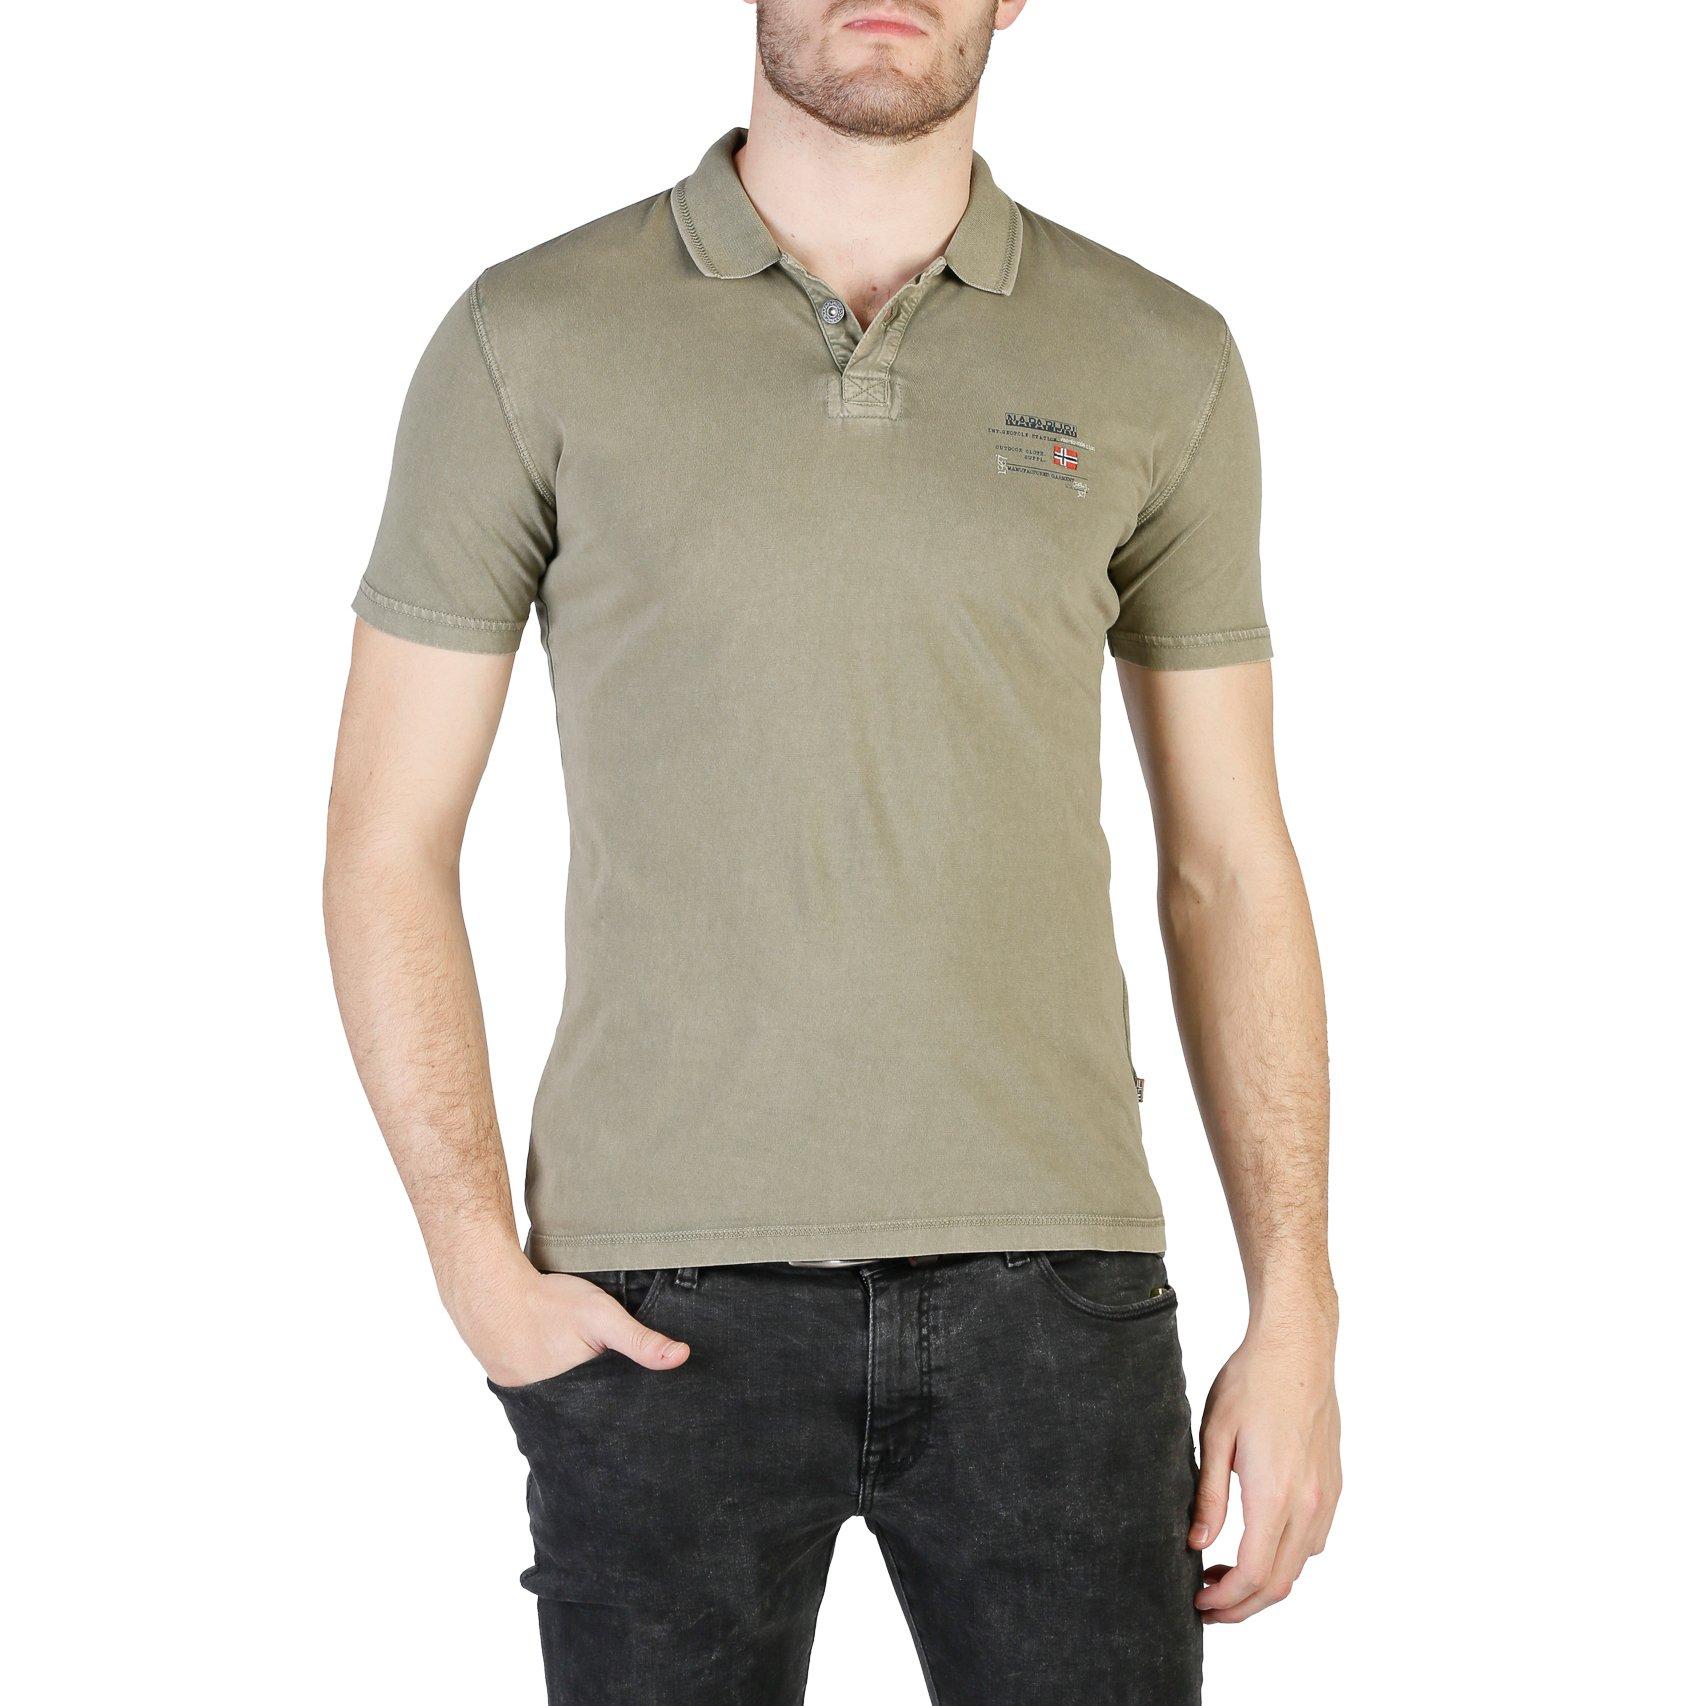 Napapijri Men's Polo Shirt Various Colours N0YHQK - green S